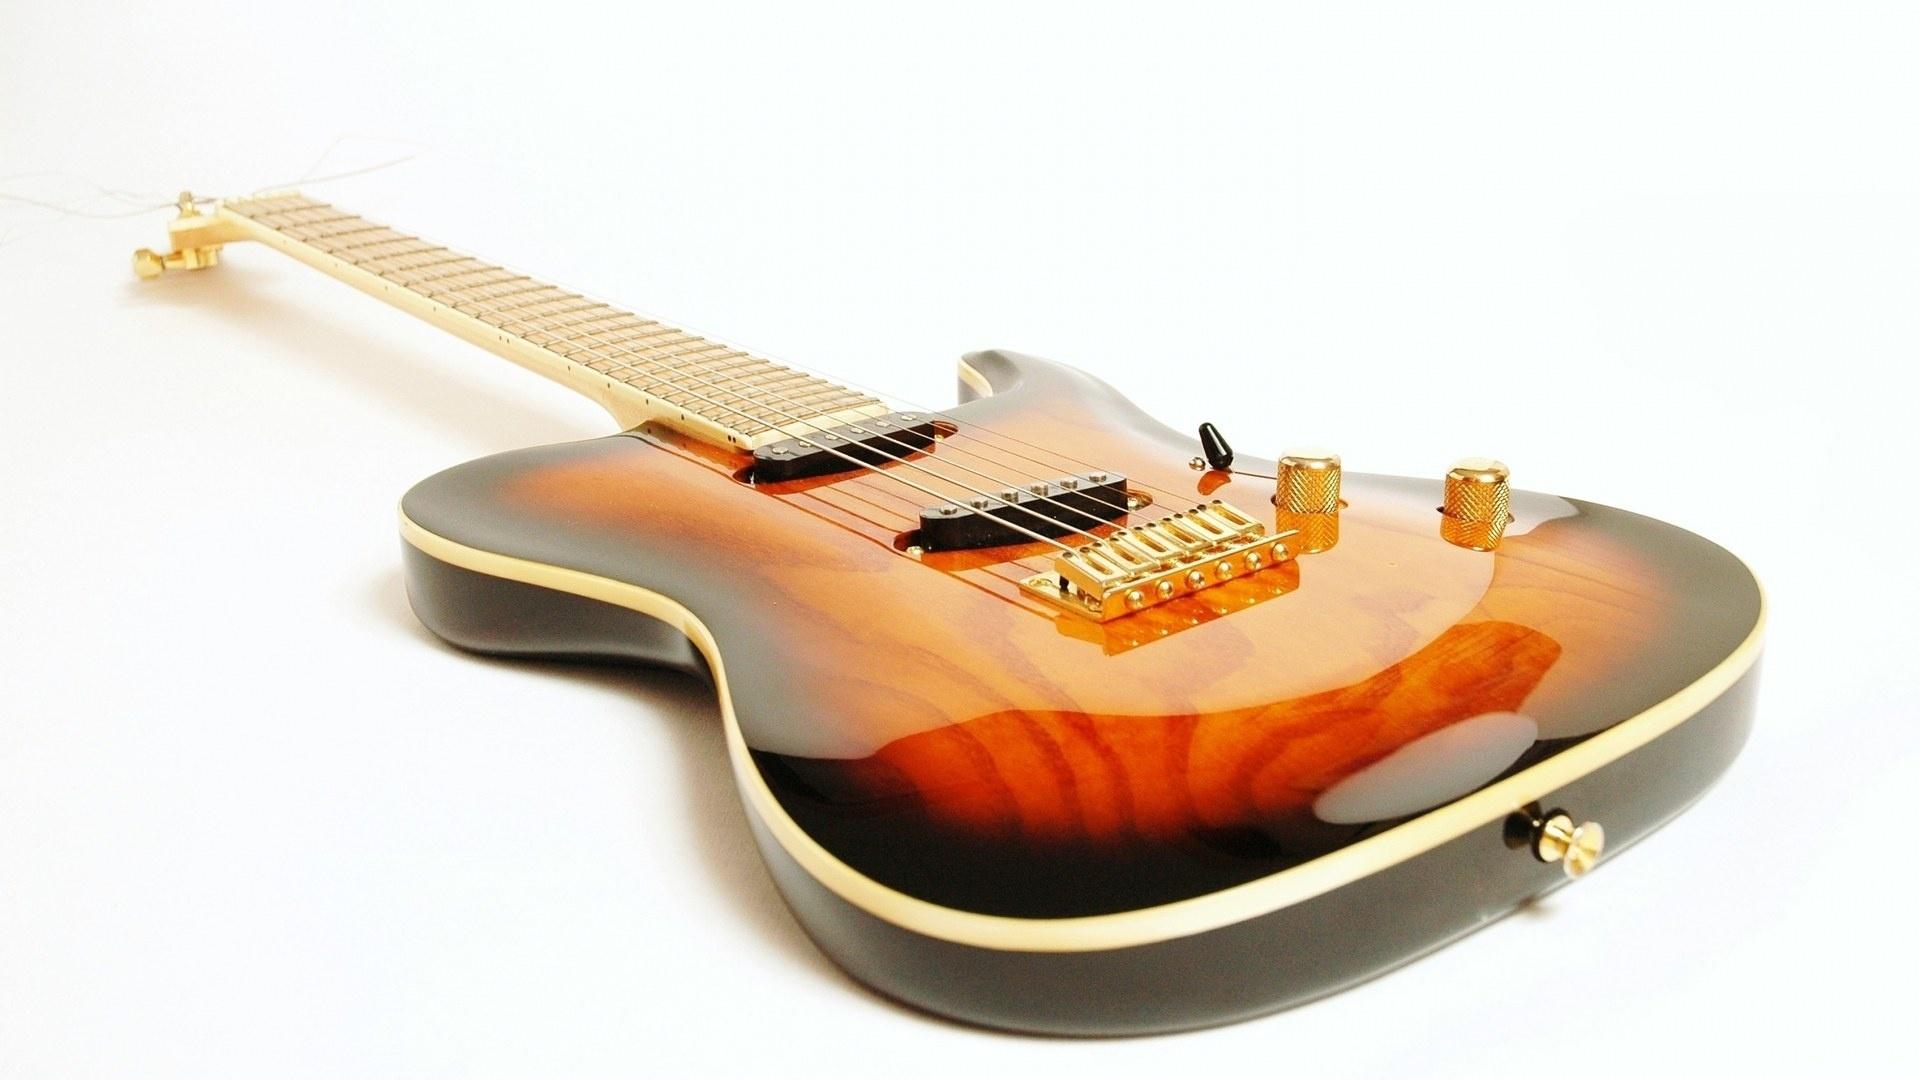 Electric Guitar Wallpapers For Desktop 3336 Hd Wallpapers in Music 1920x1080